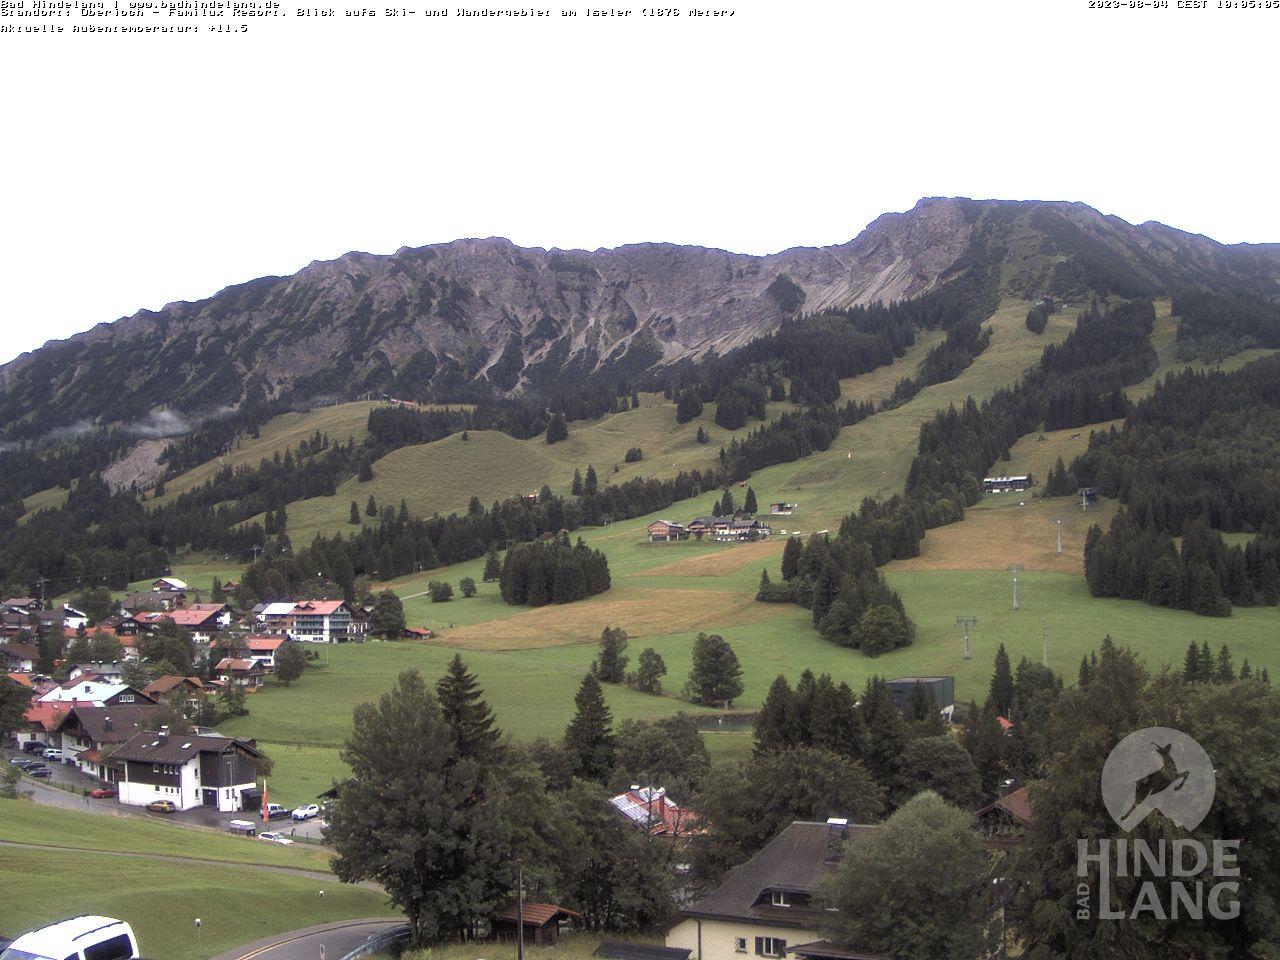 Webkamera Oberjoch-Bad Hindelang